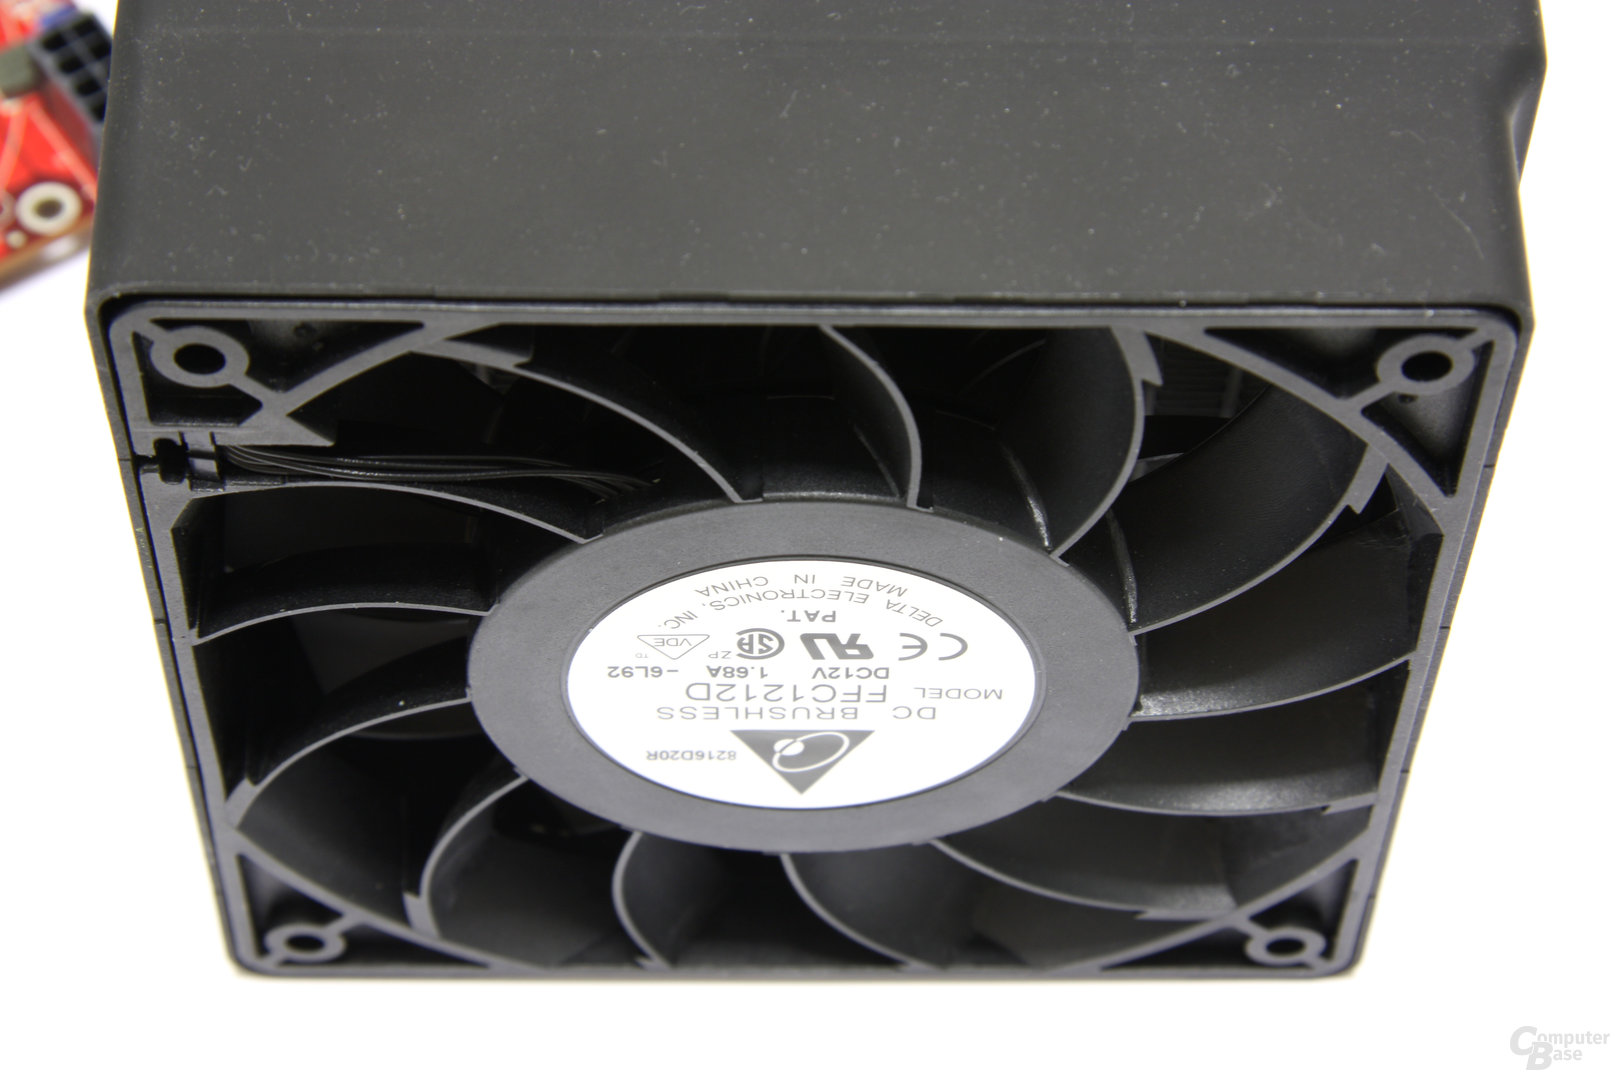 Radeon HD 3870 X2 Atomic Radiatorlüfter